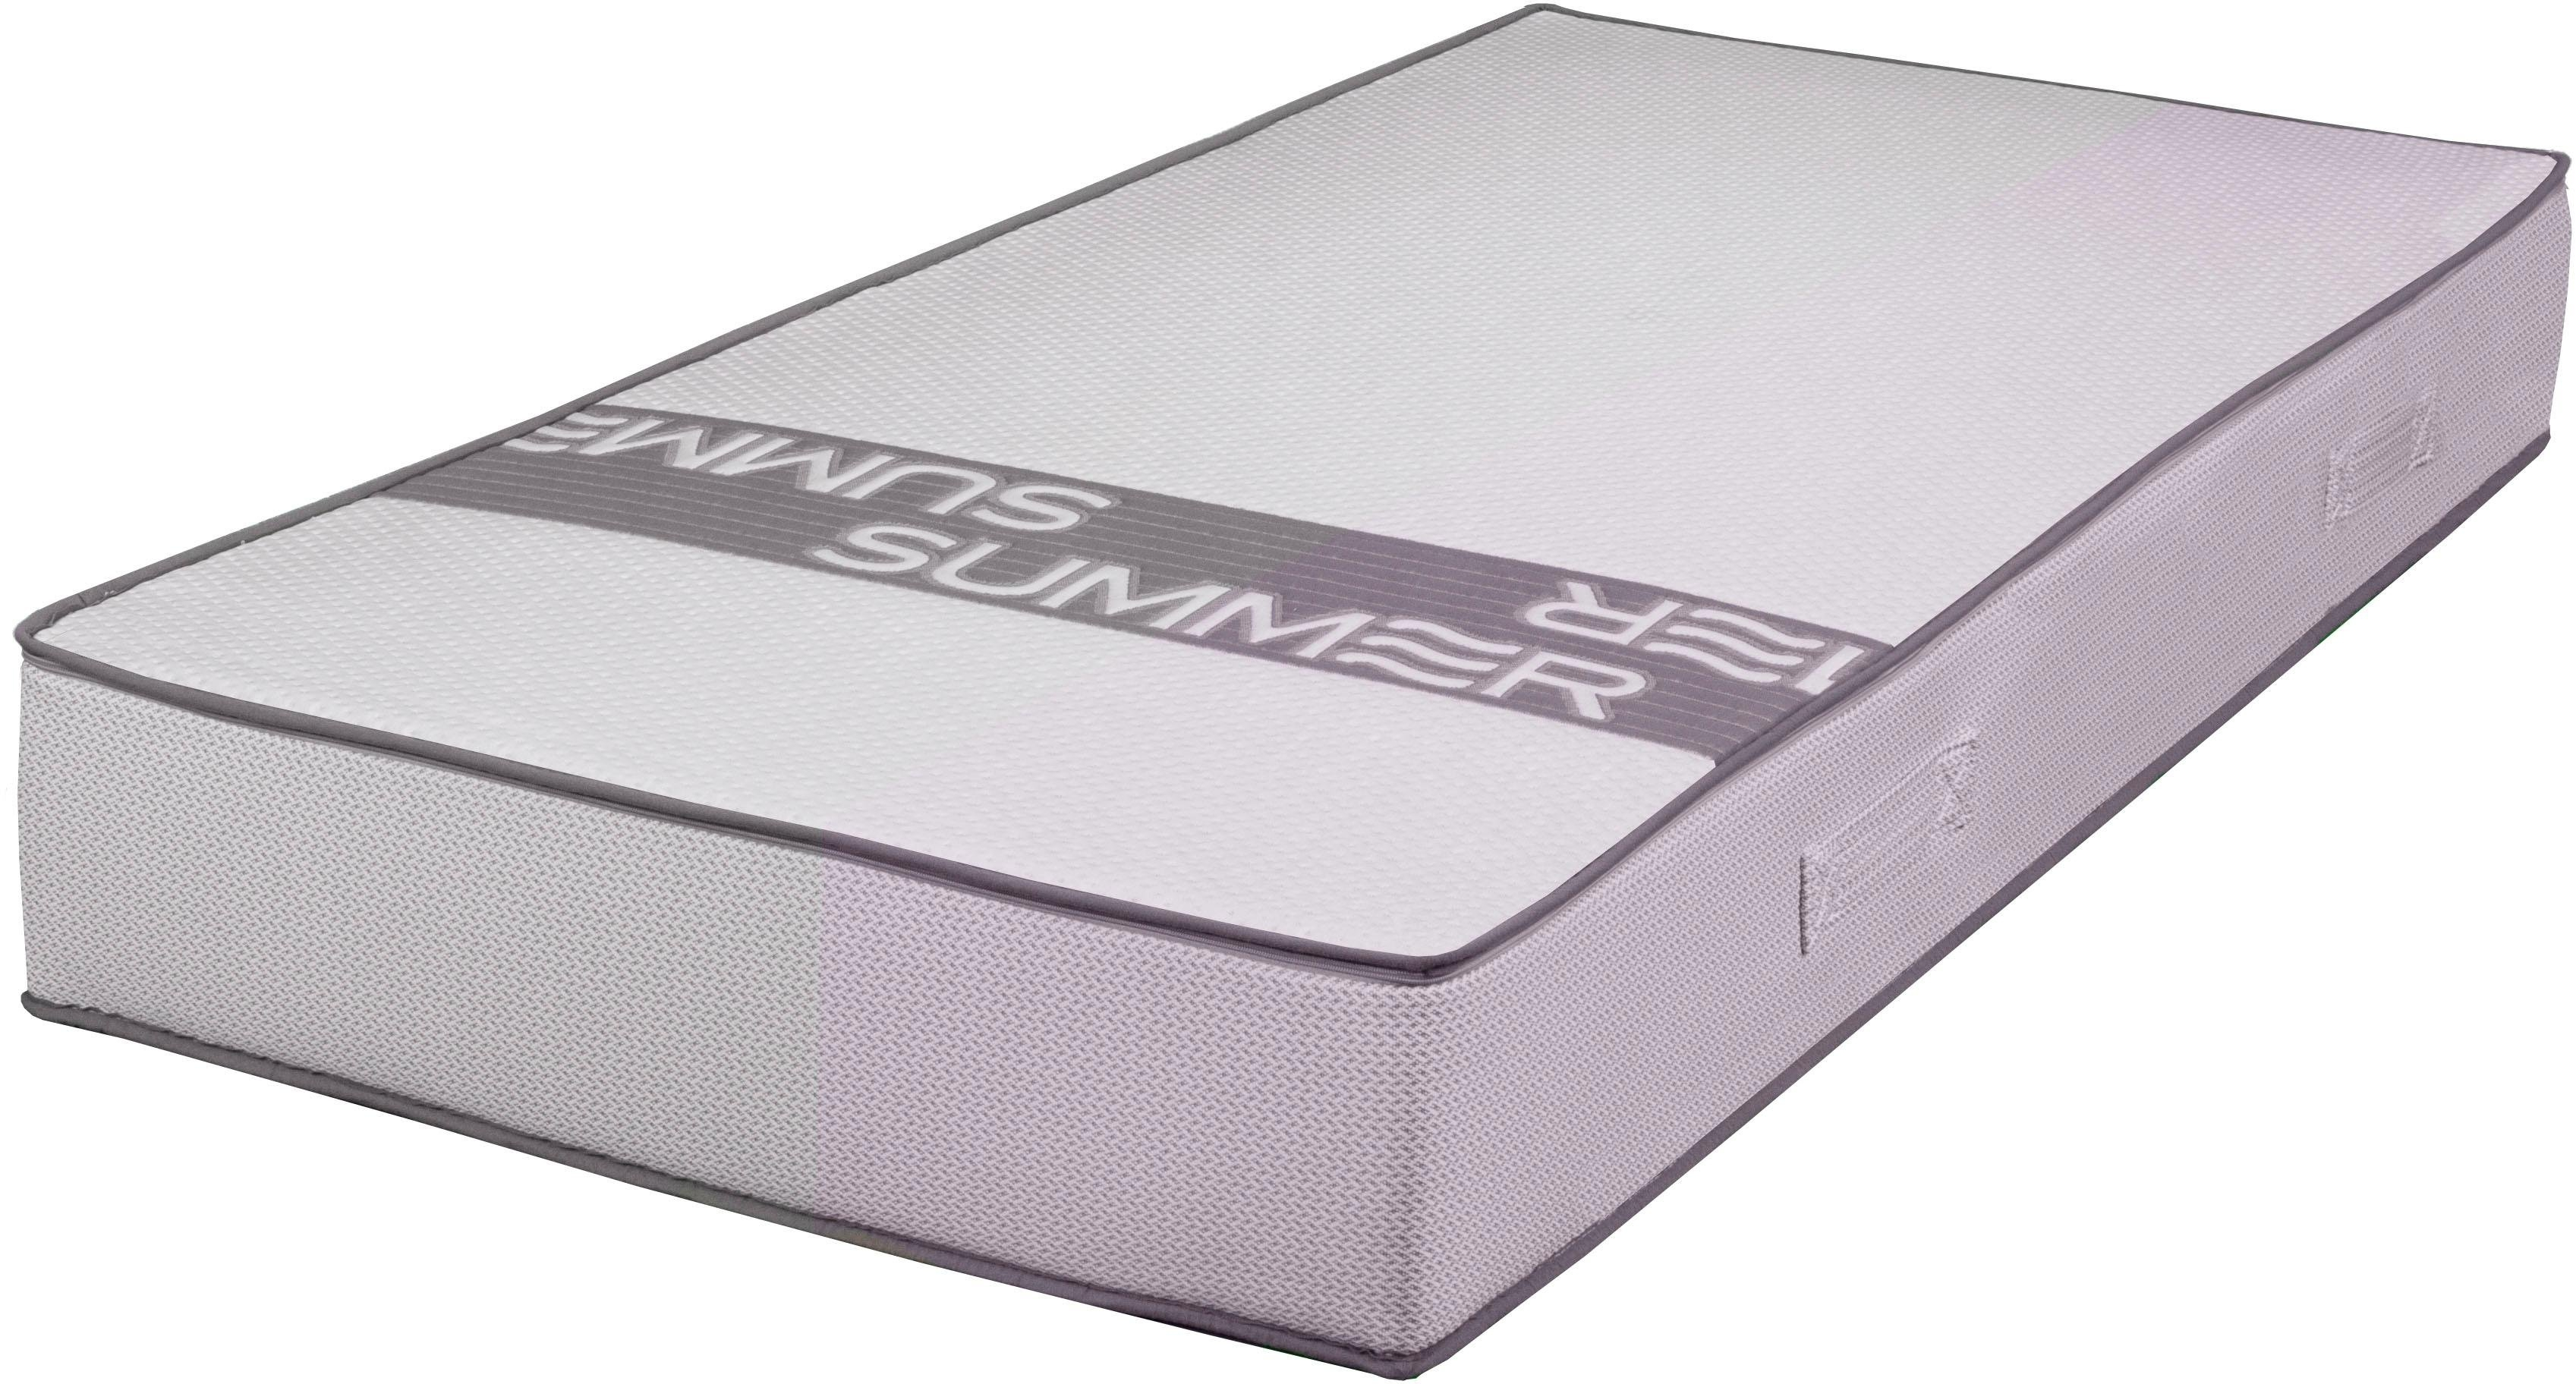 Breckle pocketveringsmatras »SMARTSLEEP® 7000« online kopen op otto.nl